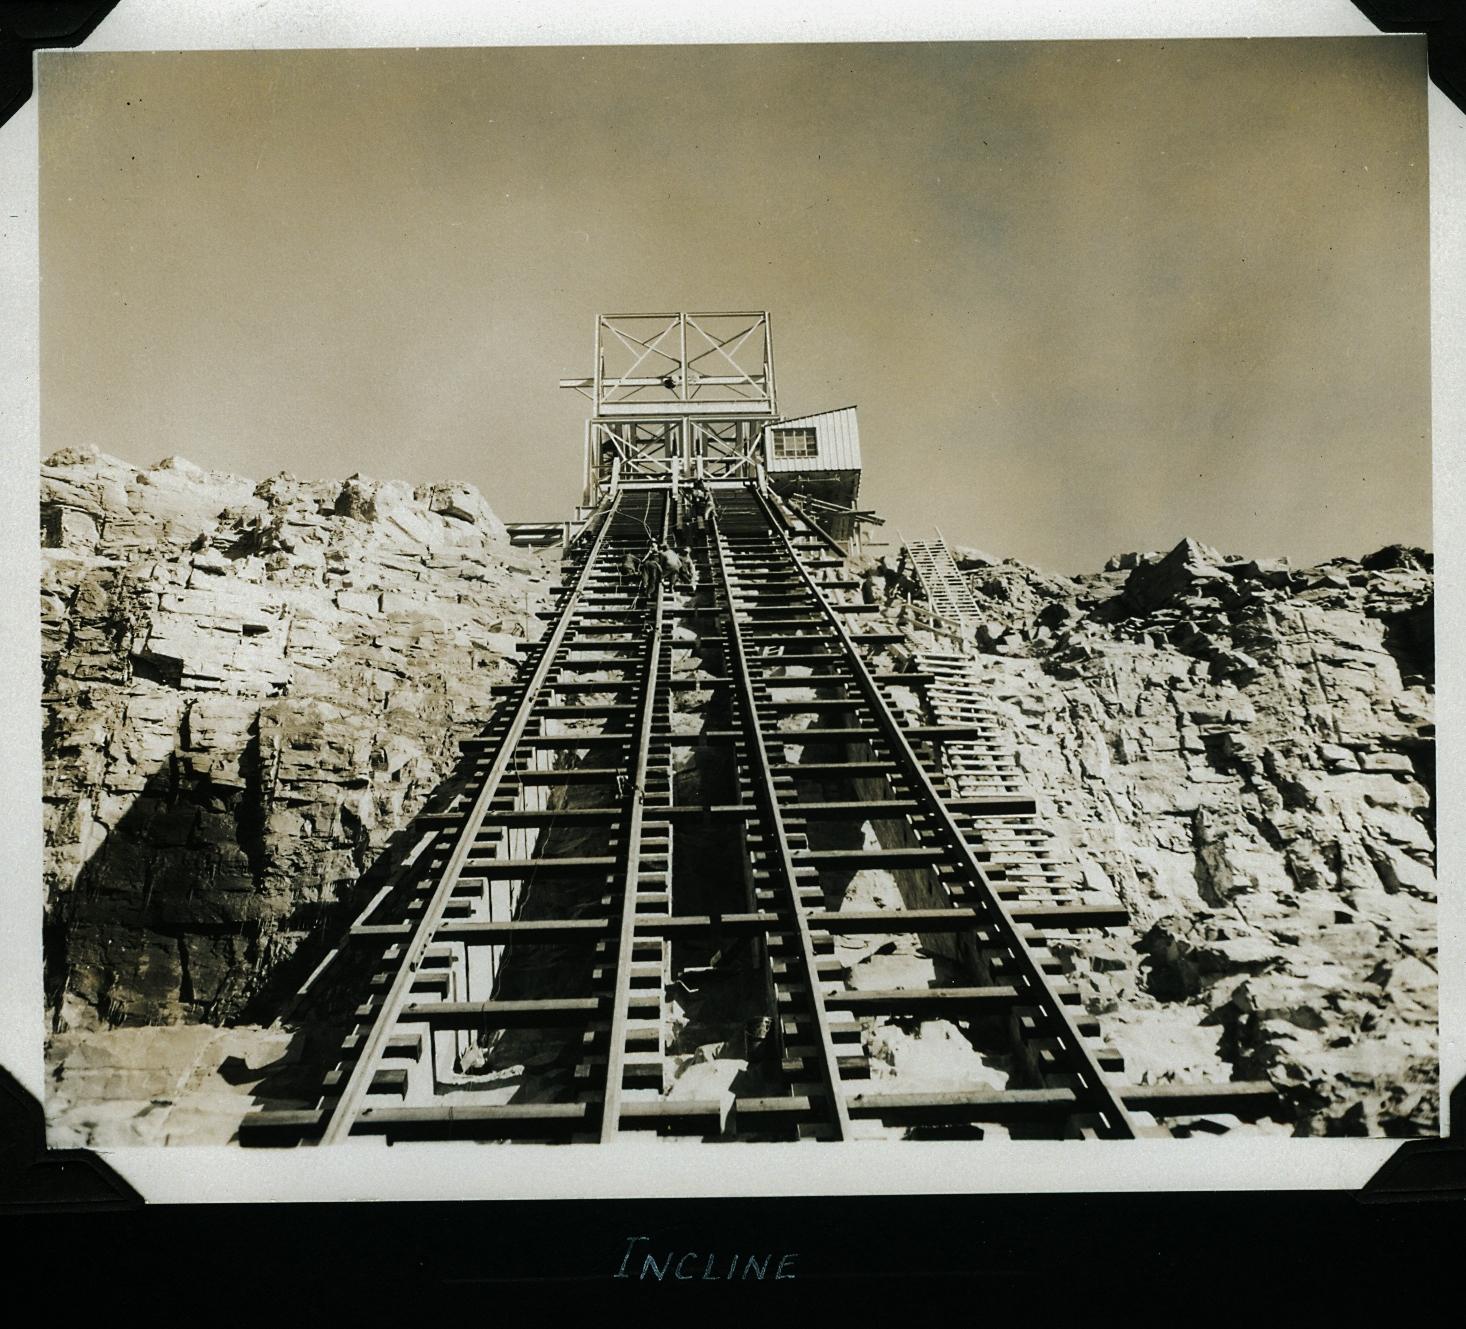 Marmoraton Mine - incline